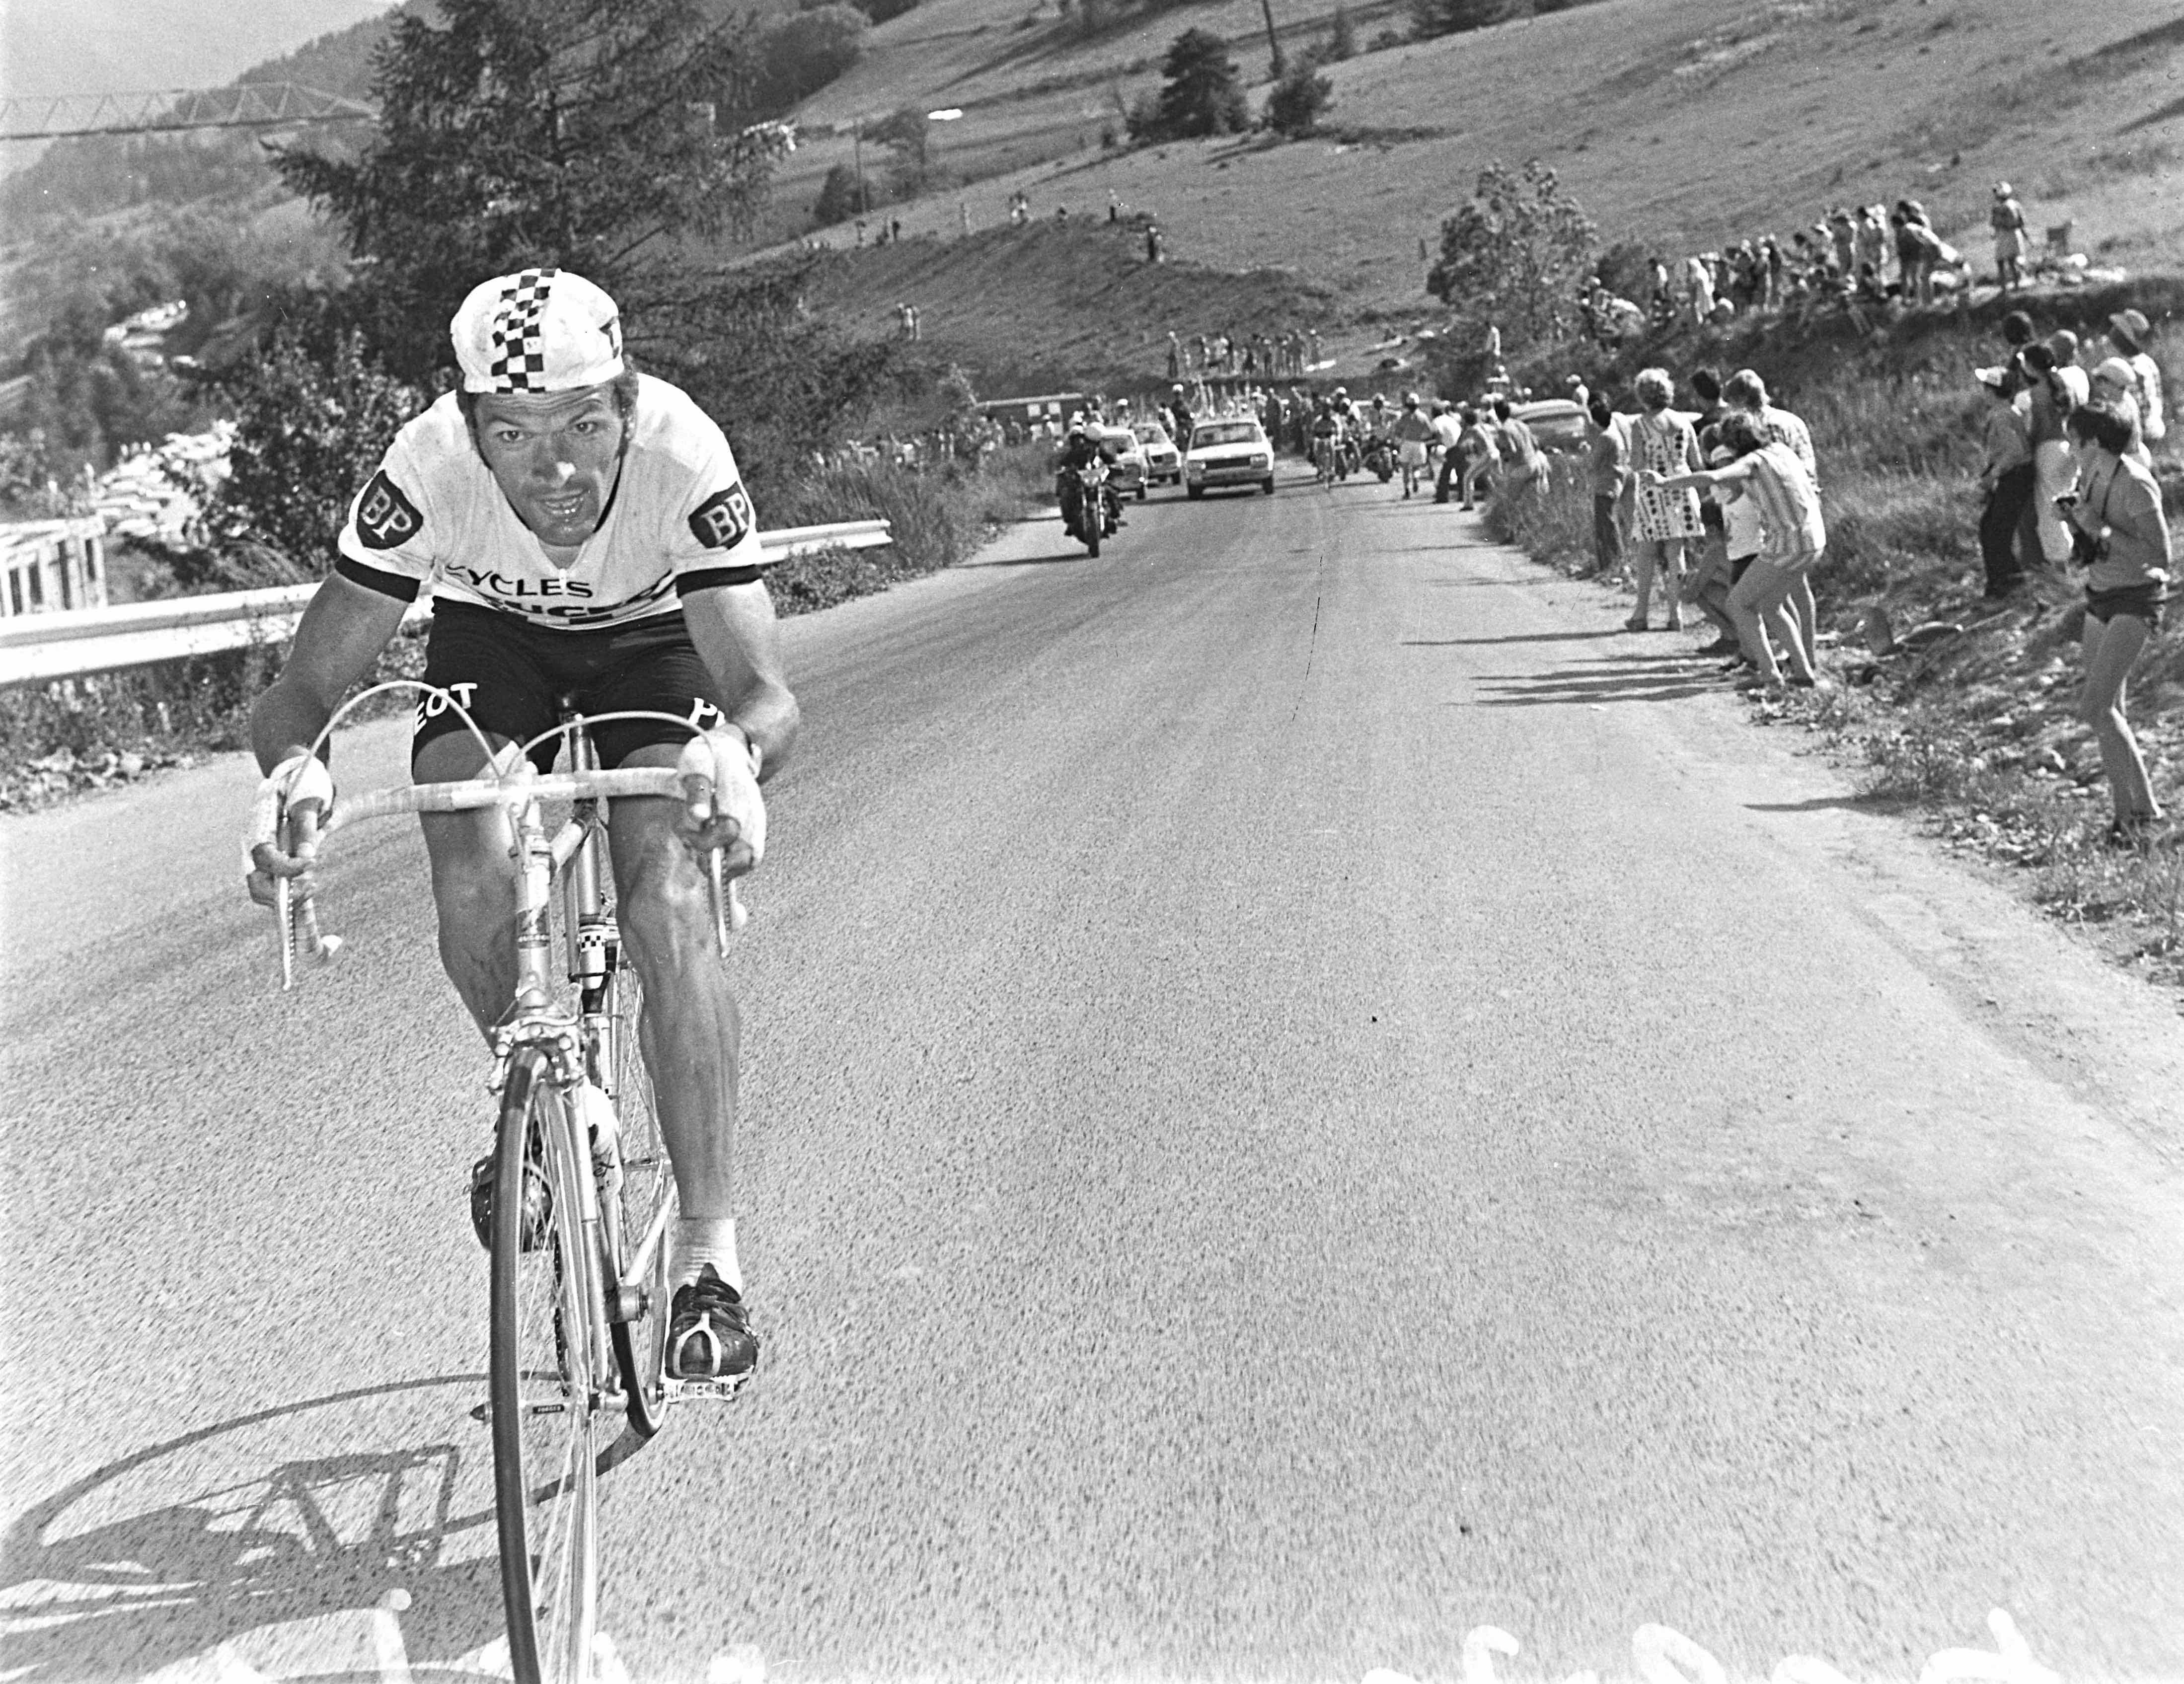 CYCLISME - TOUR DE FRANCE 1975 - 1975 thevenet (bernard) - (fra) -  fonds n/b